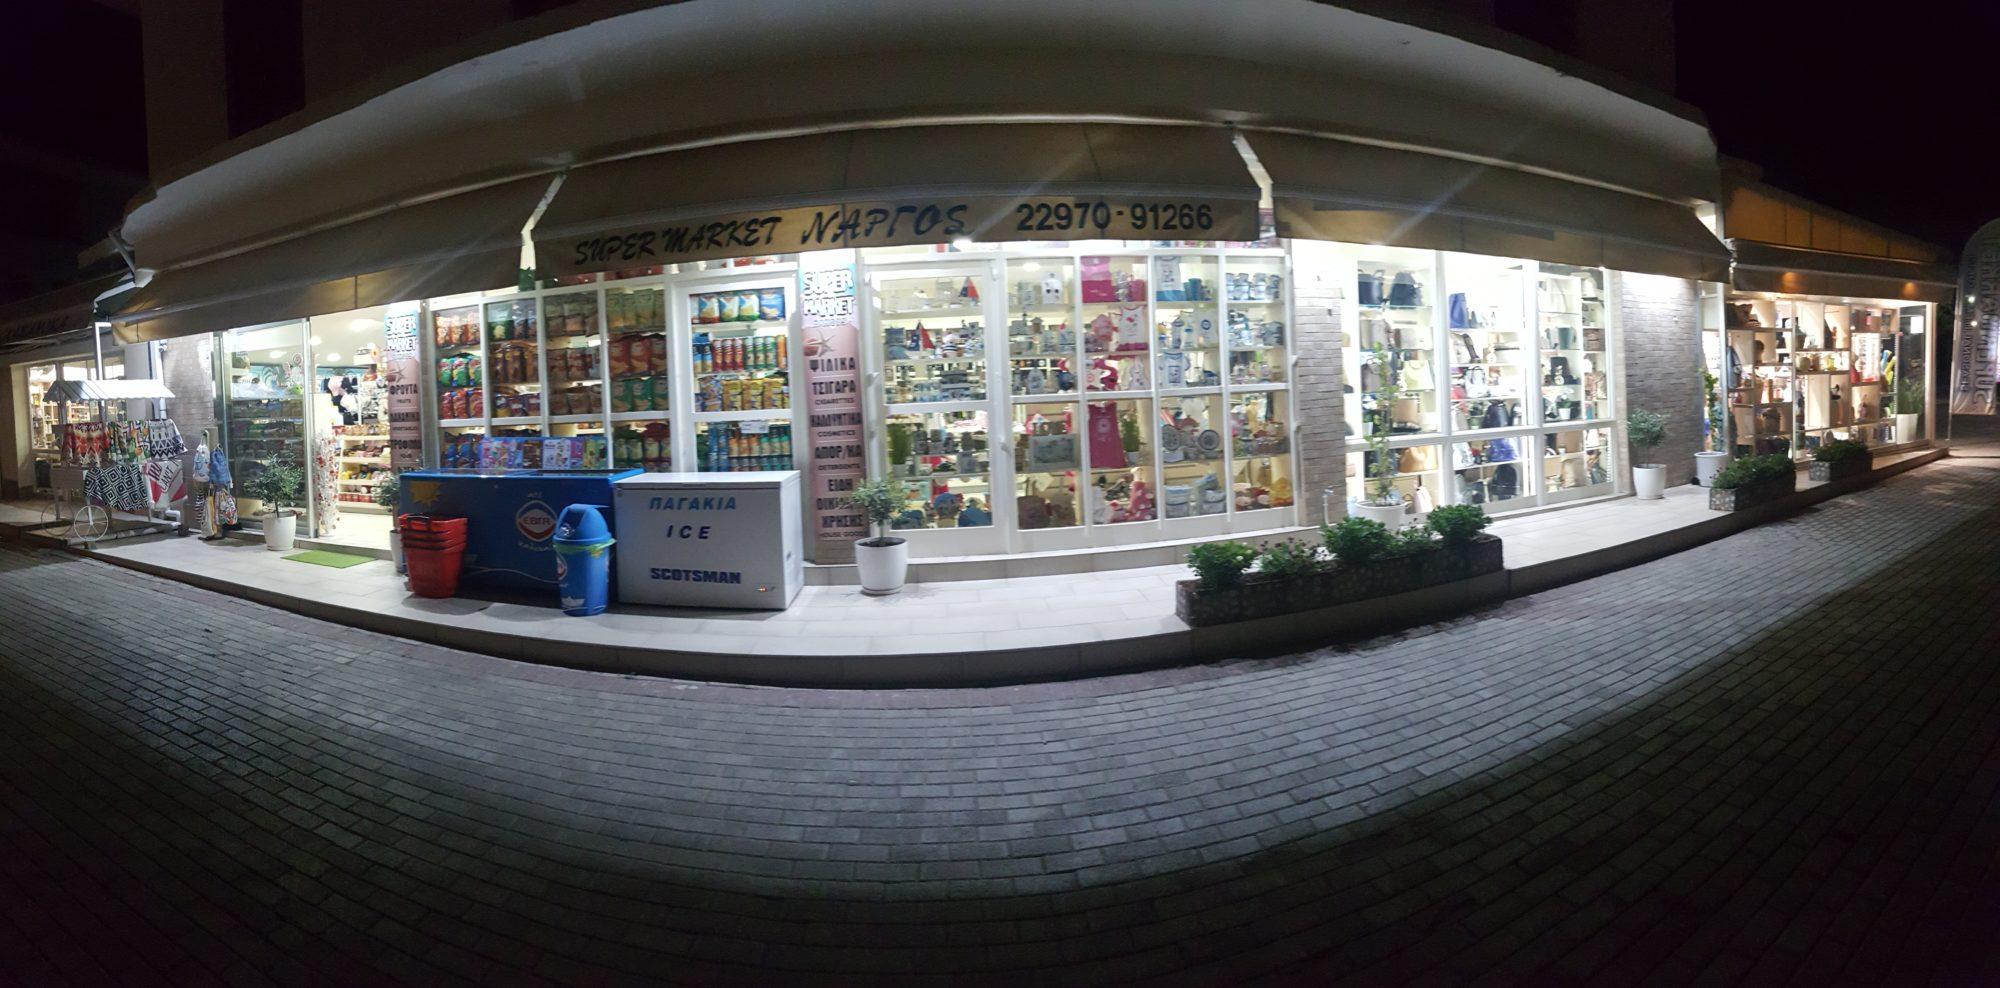 Super market Νάργος